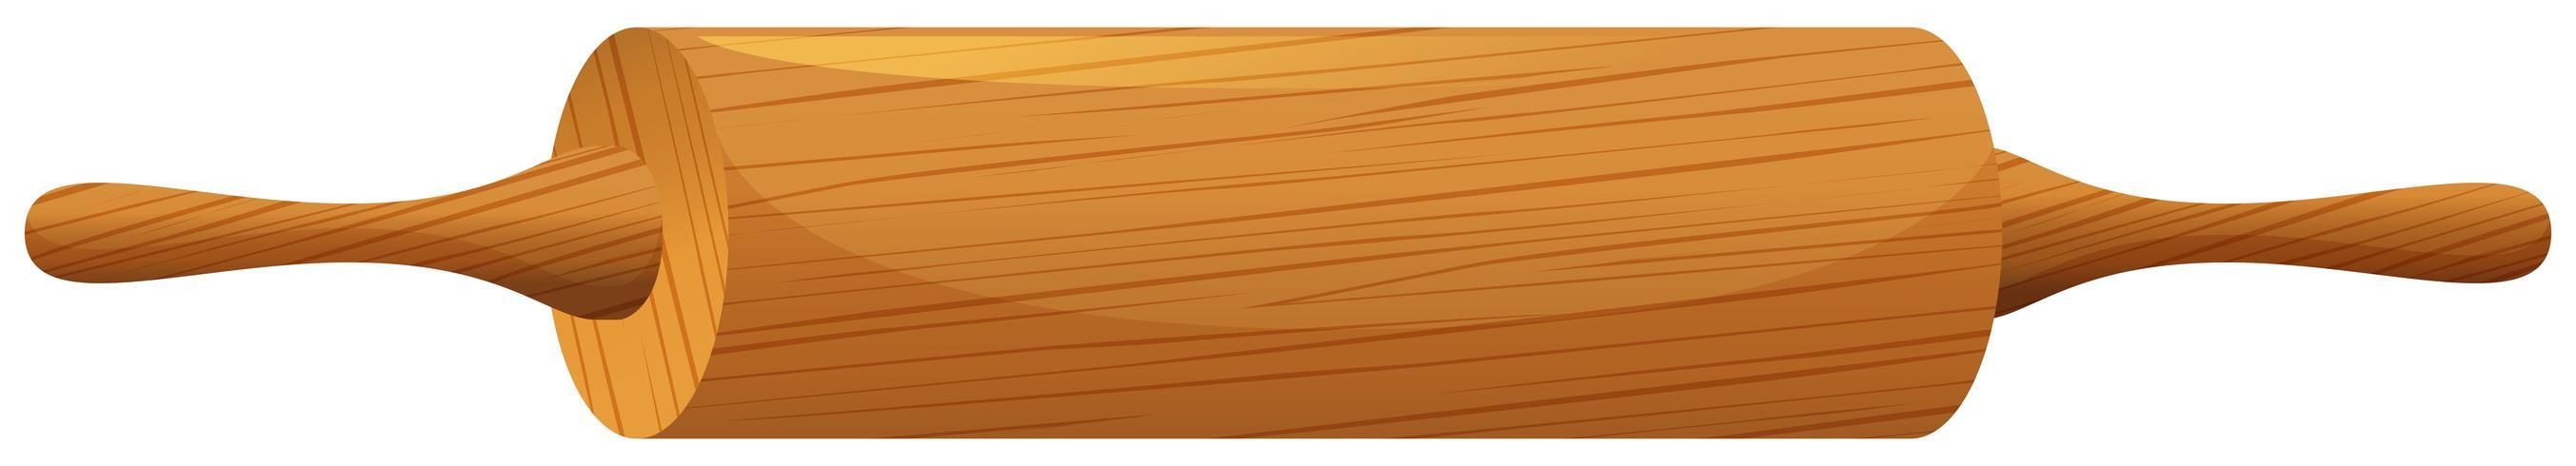 Perno de rodillo de madera vector